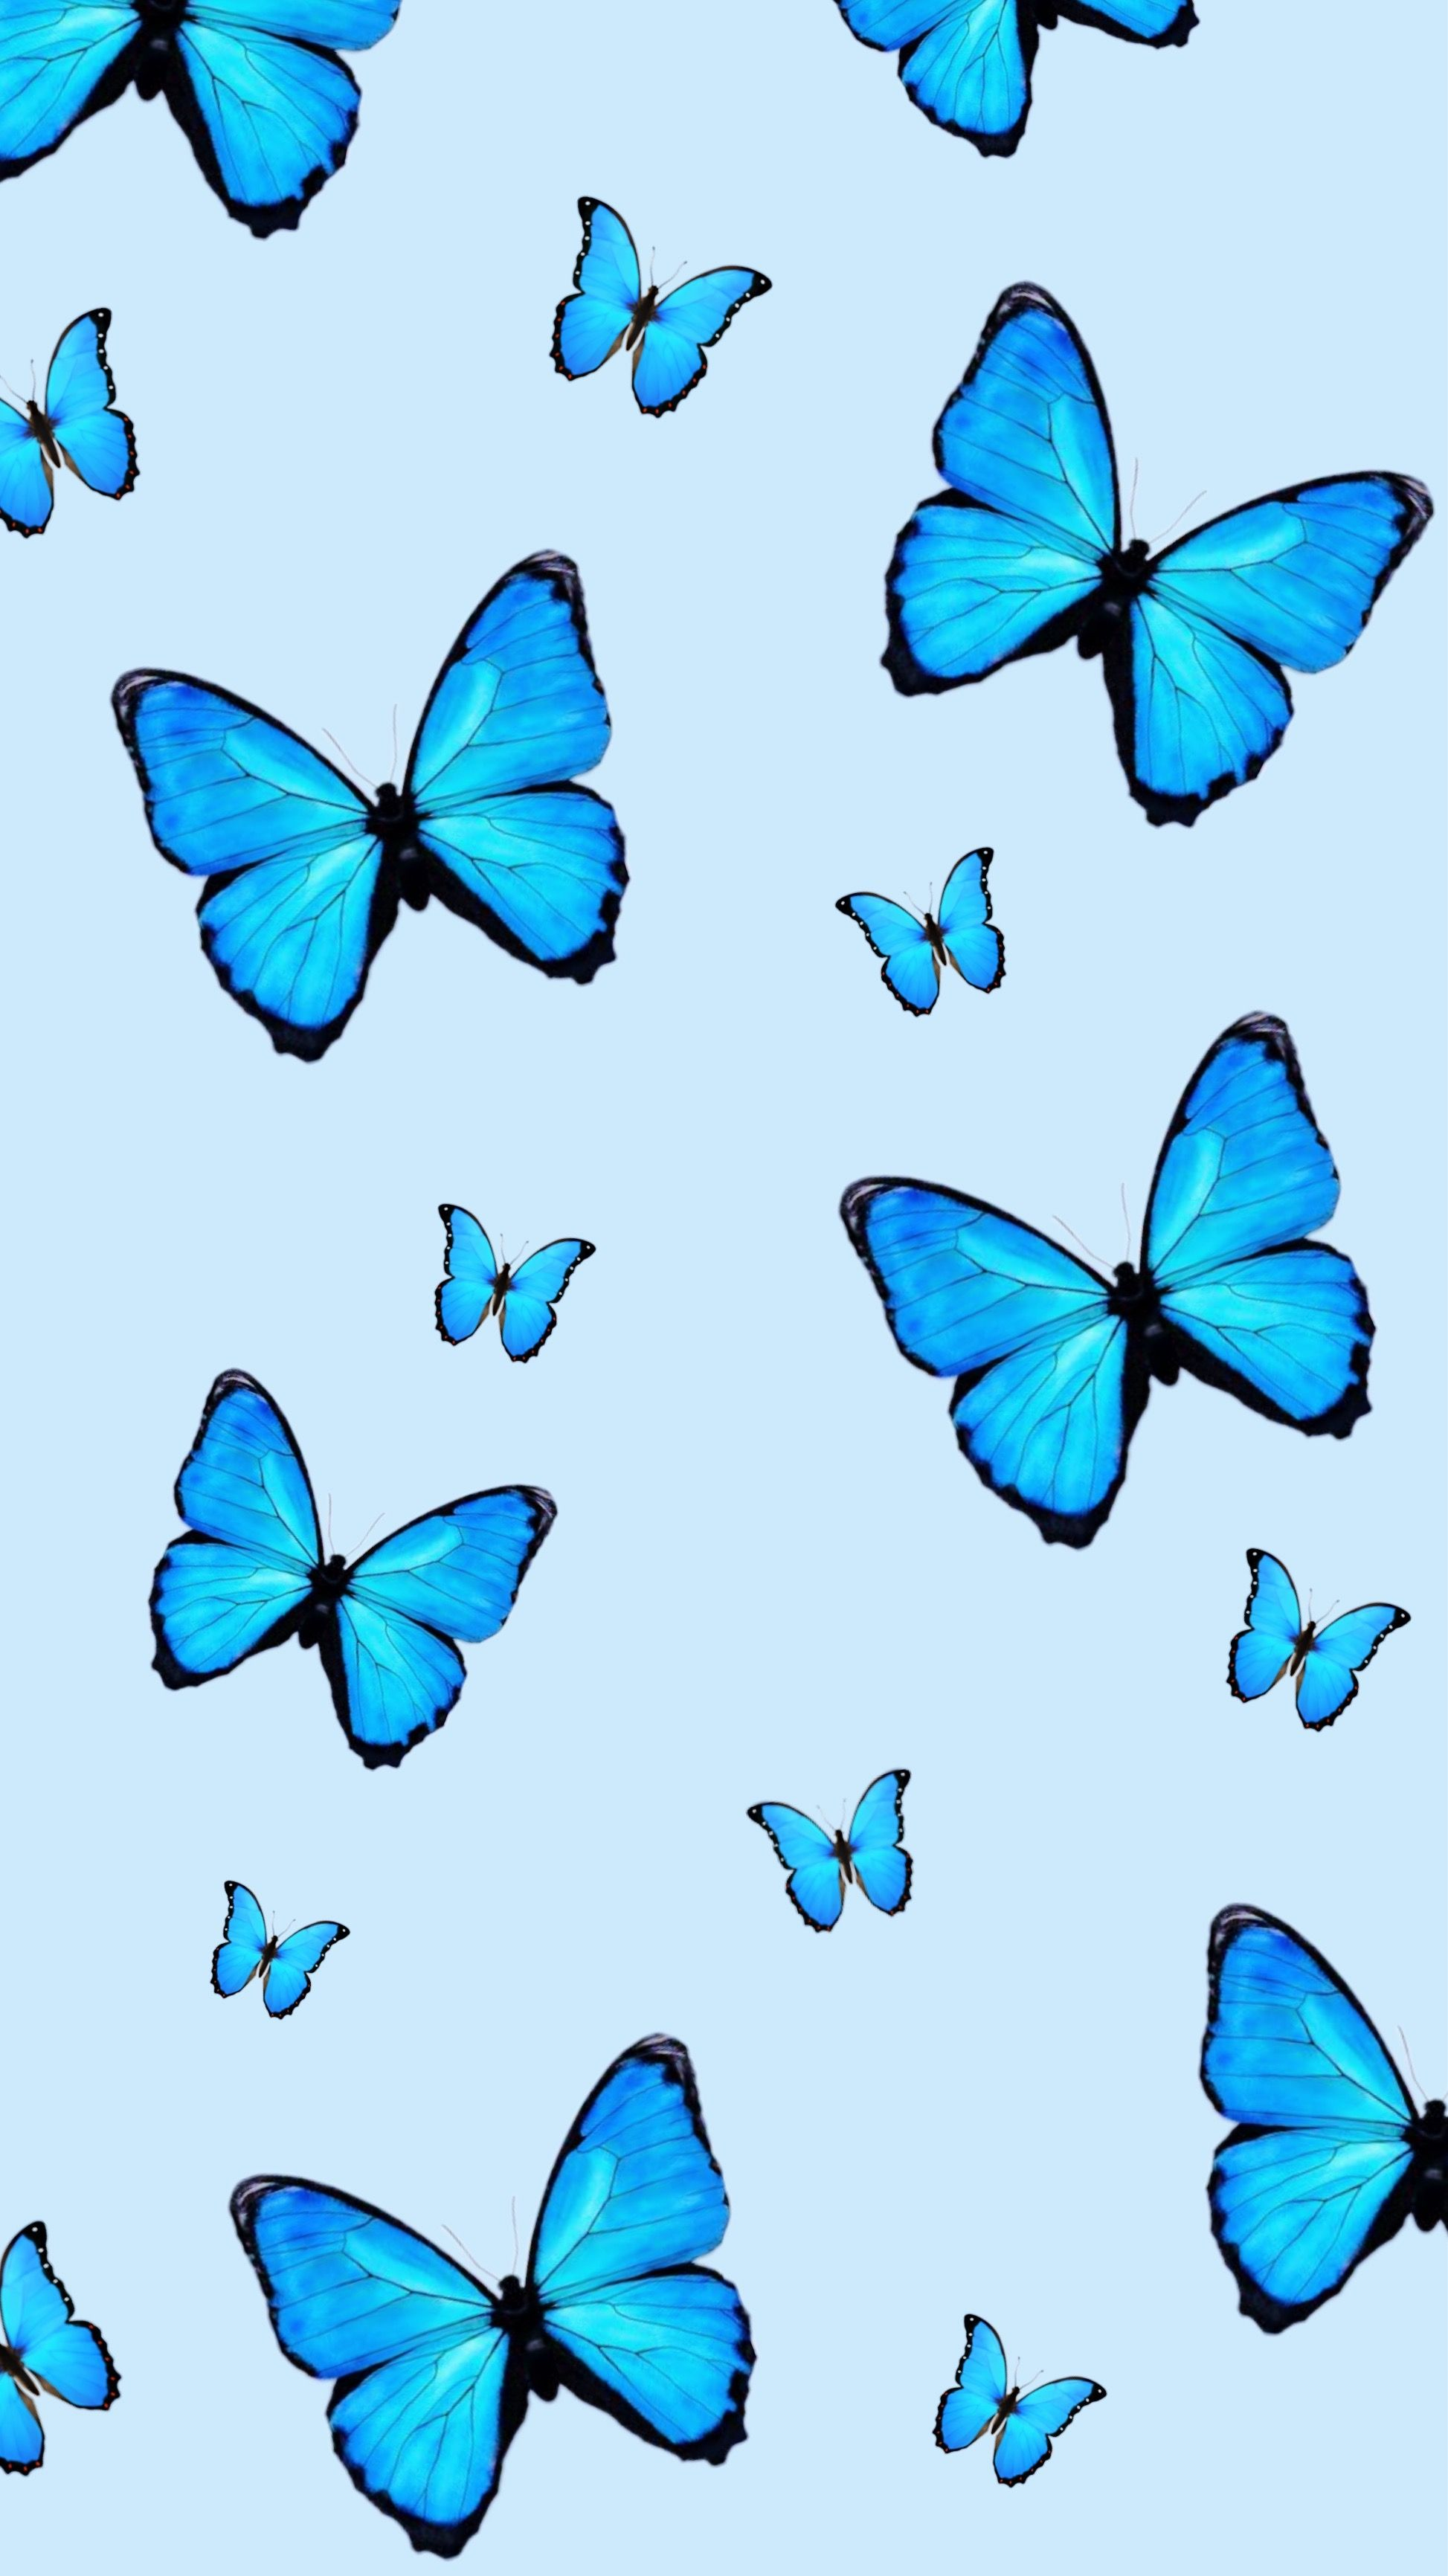 Pin By Jojoaliciac On Wallpaper Cute Black Wallpaper Butterfly Wallpaper Butterfly Wallpaper Iphone